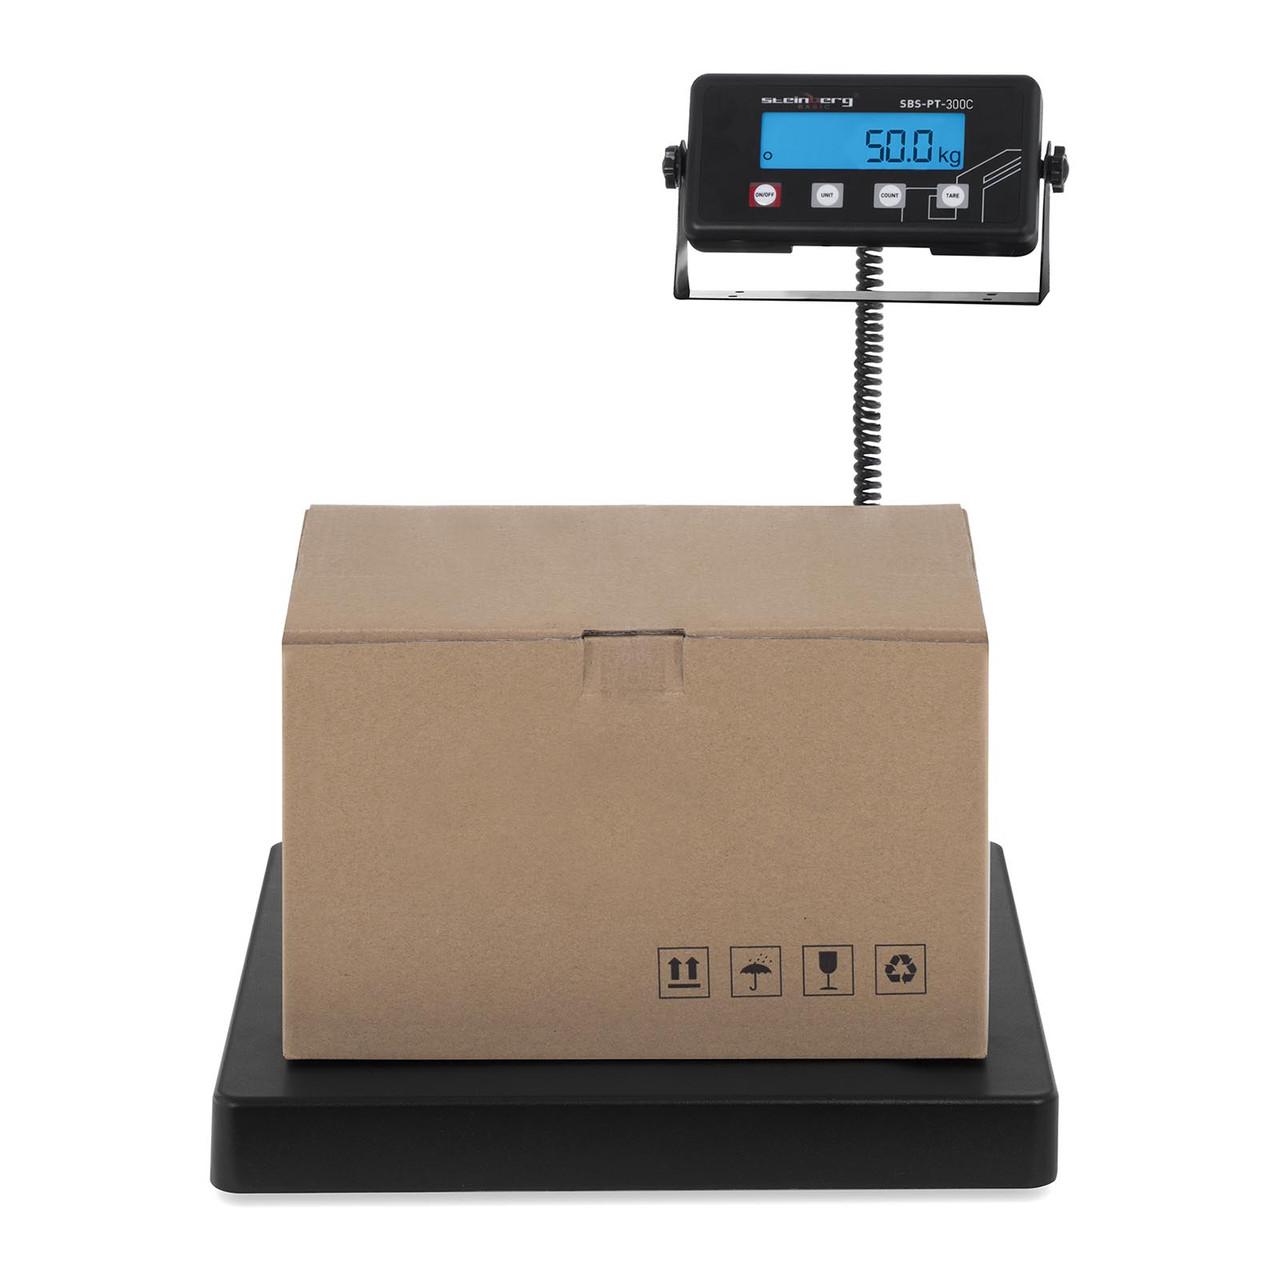 Весы складские настольные - 300 кг / 50 г - ЖК-терминал Steinberg Systems